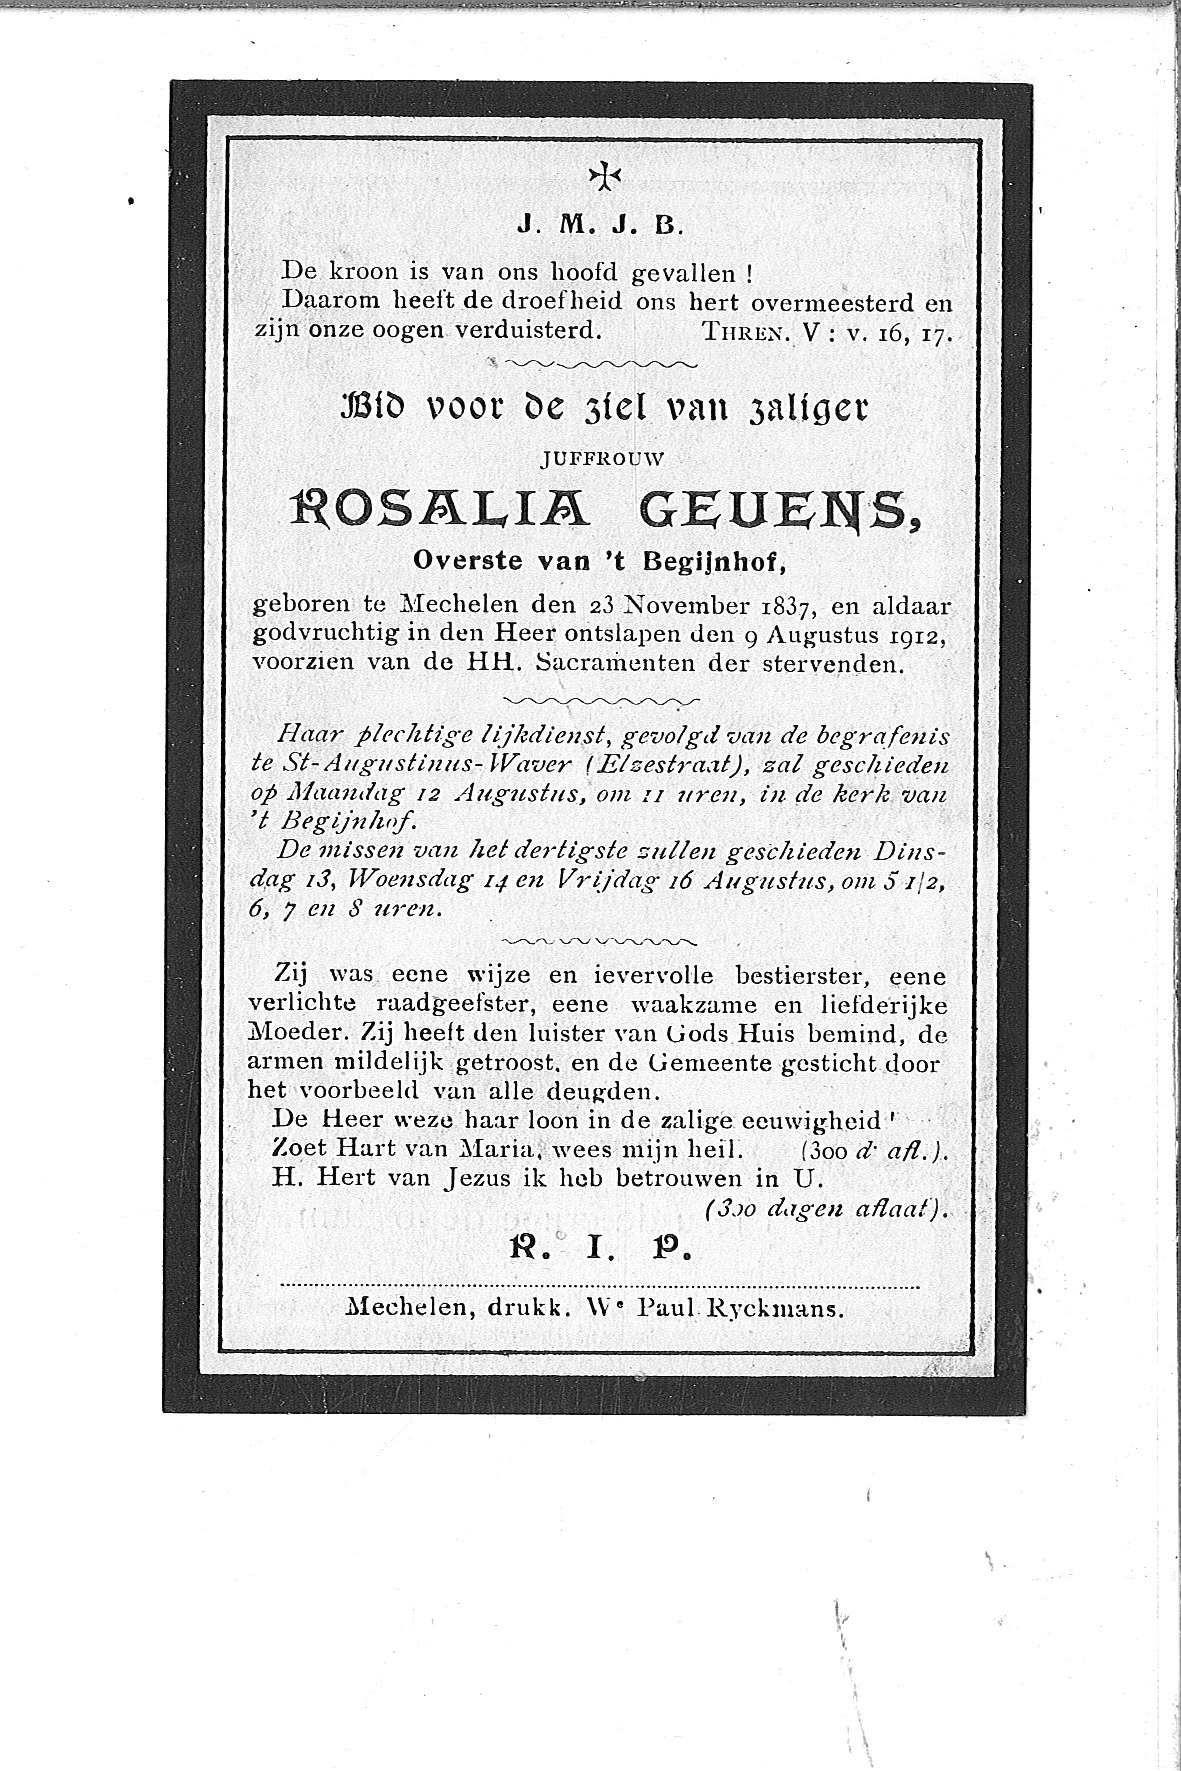 Rosalia (1912)20131210144048_00030.jpg